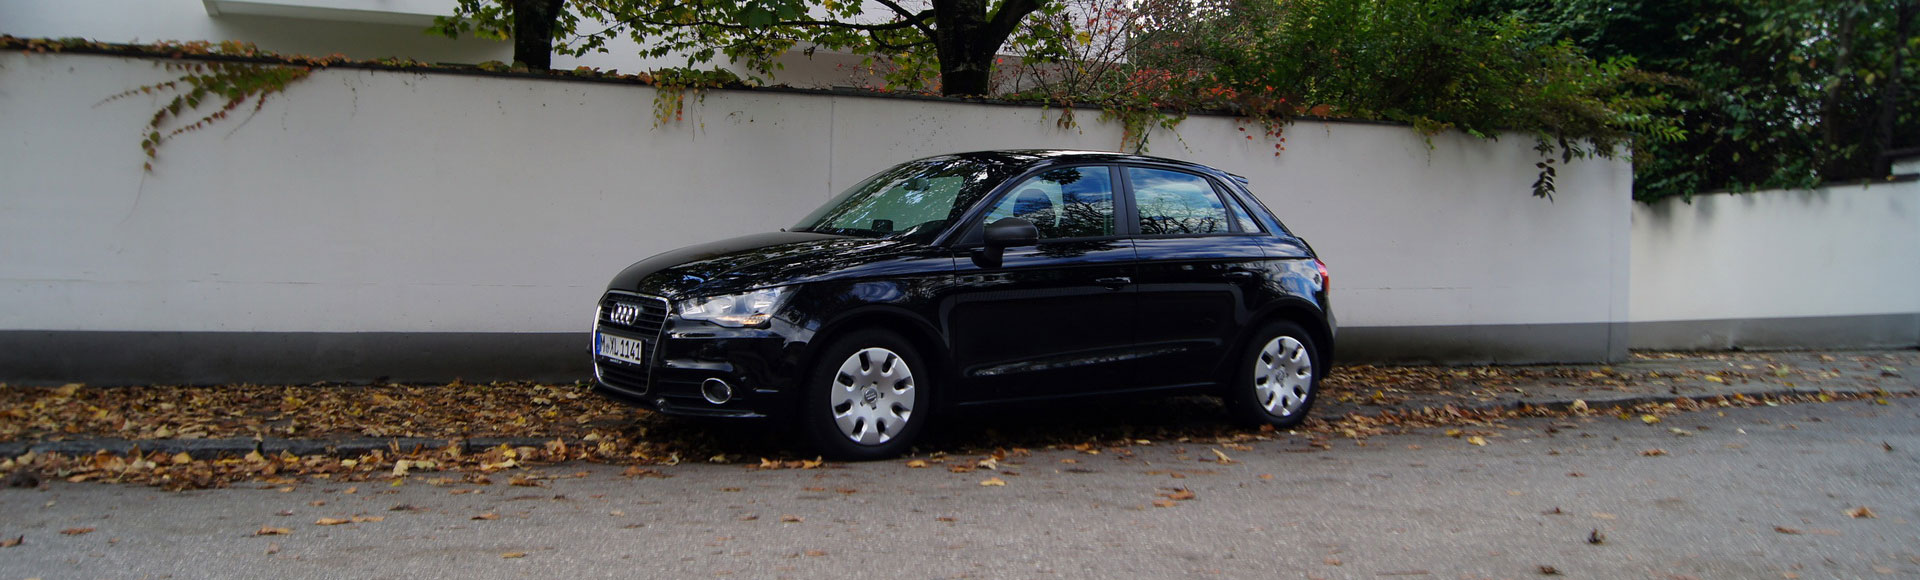 Audi A1 Sportback 2012 Herbst 8911